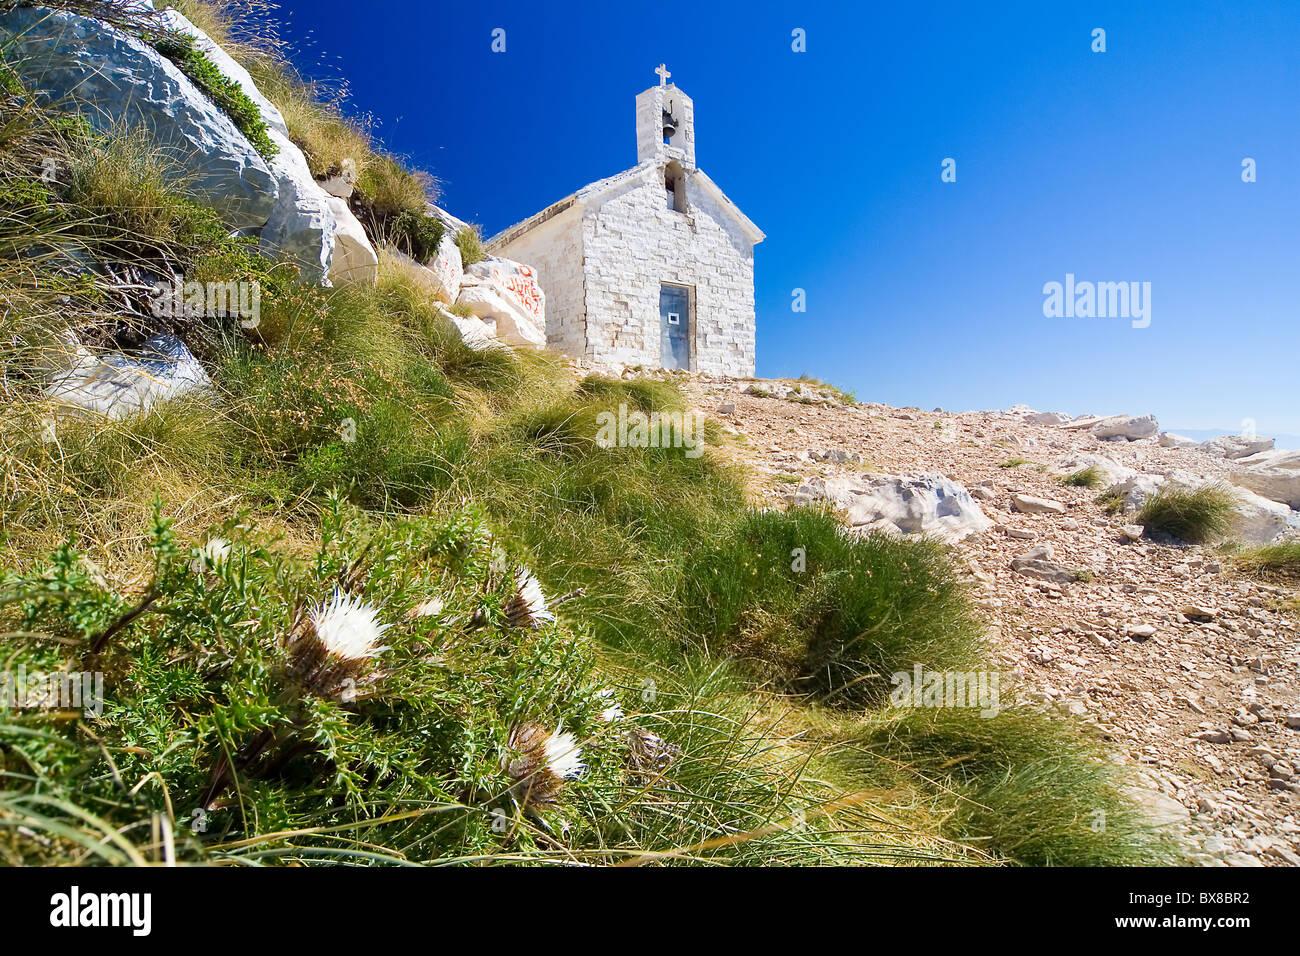 the church St. Jure - national park Biokovo (Croatia) - Stock Image